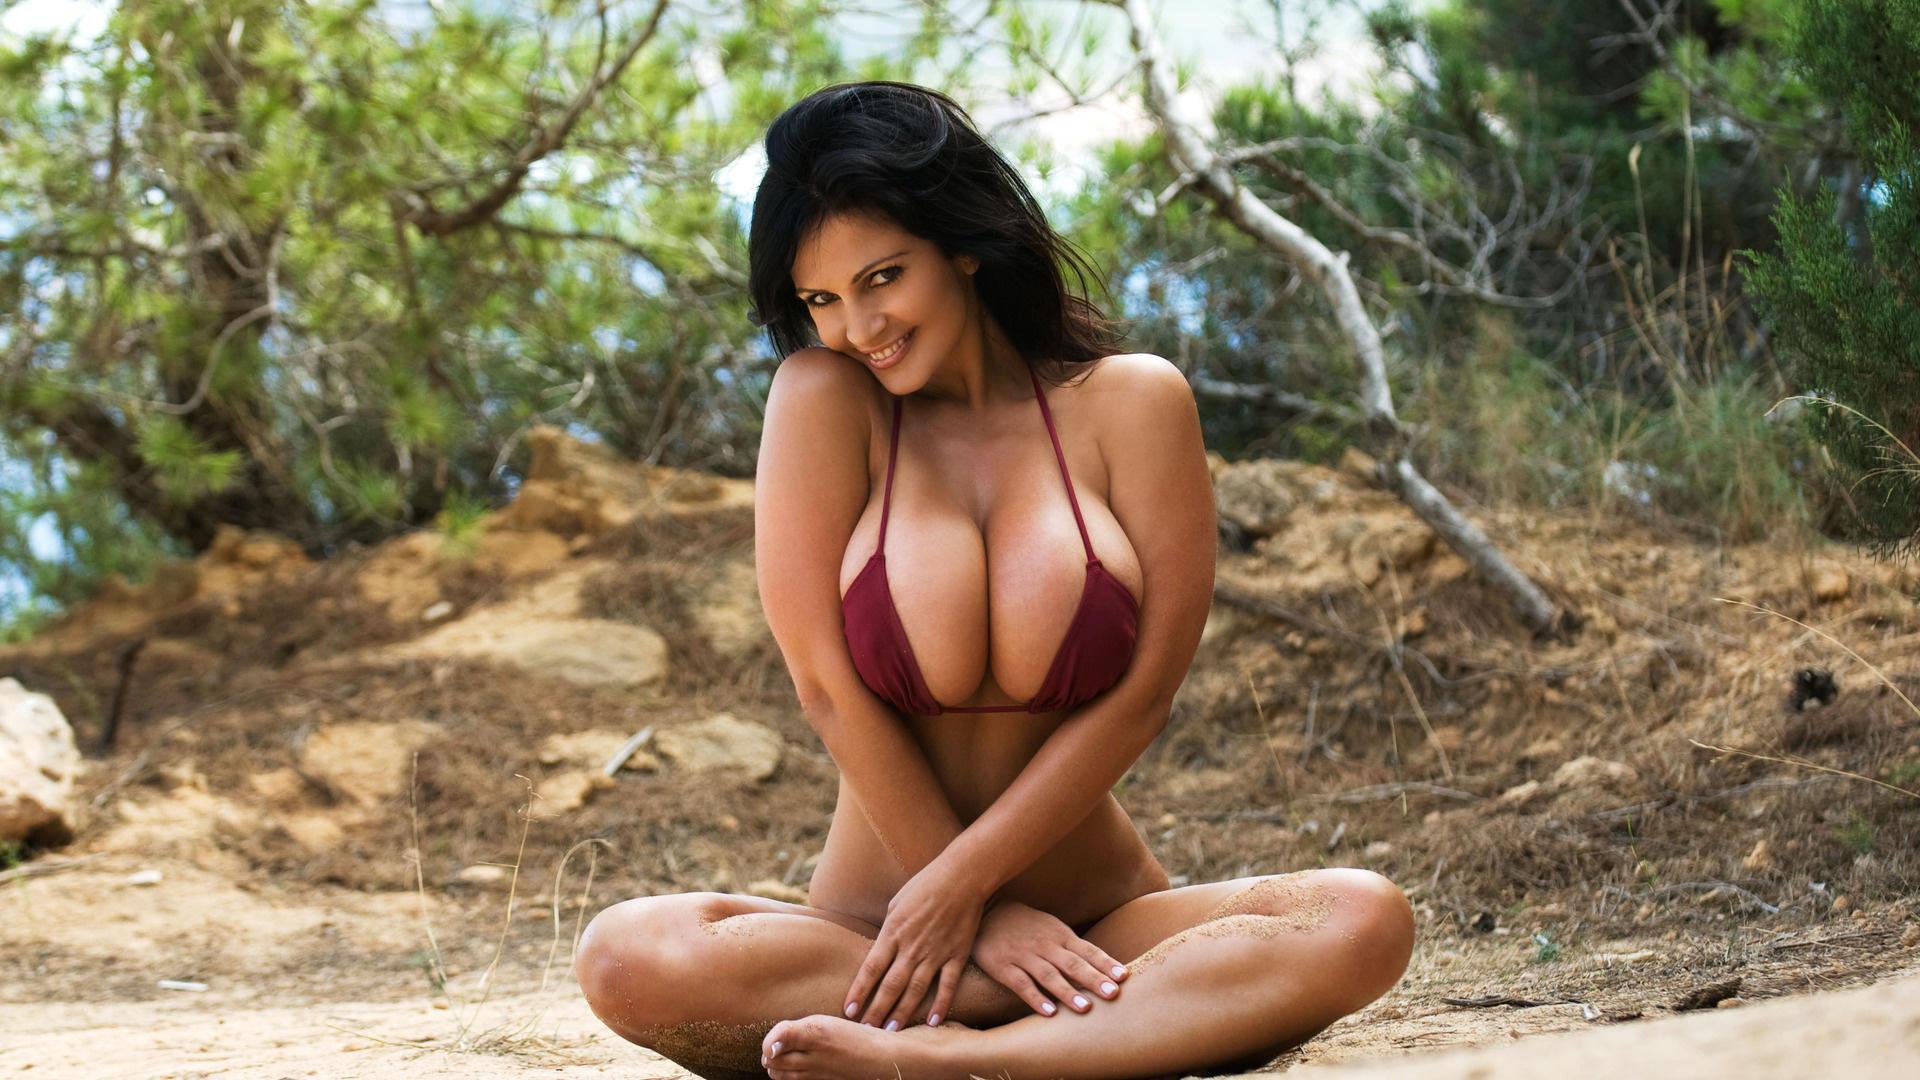 Download photo 1920x1080, denise milani, big boobs ...